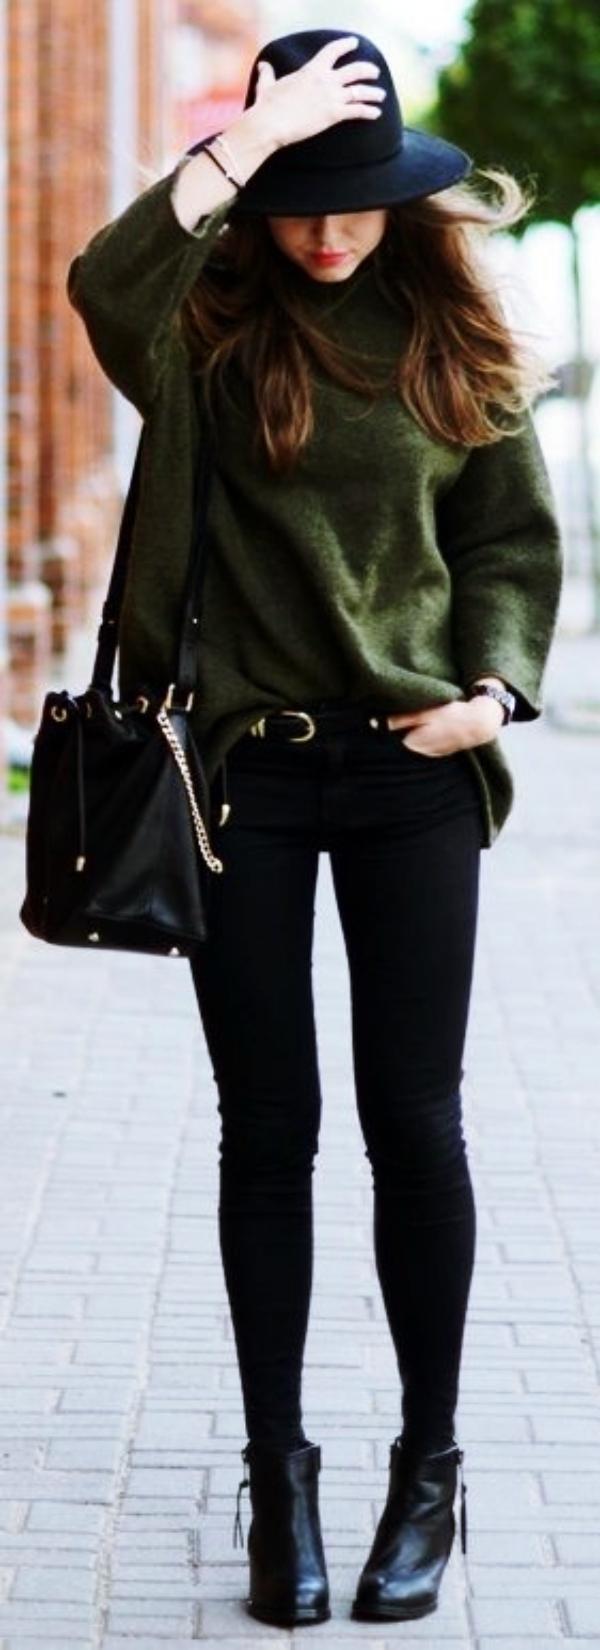 Preppy-Fashion-Outfits-20